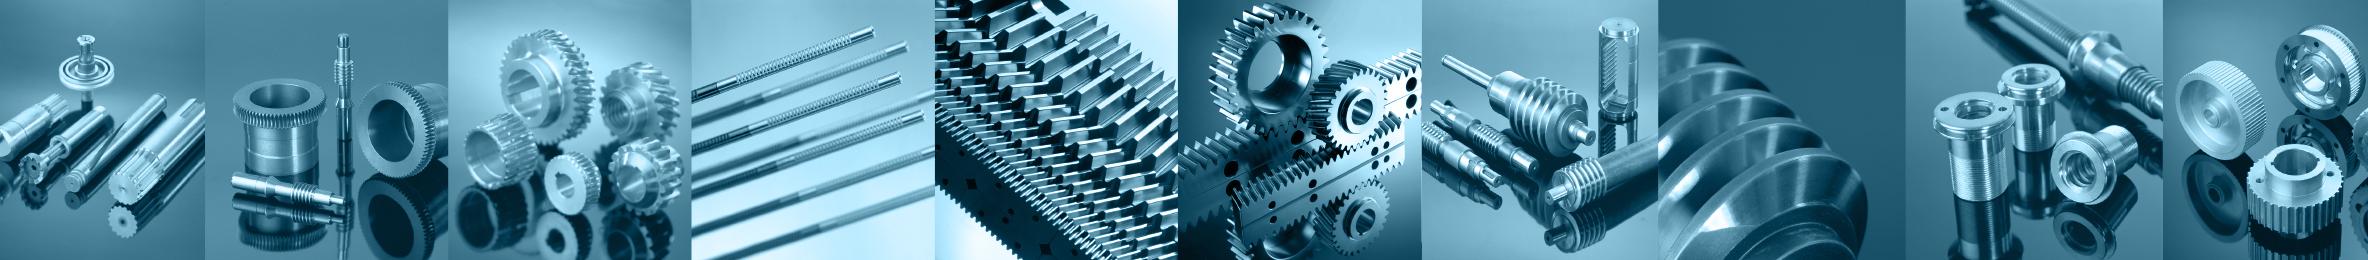 High precision mechanics customized for you